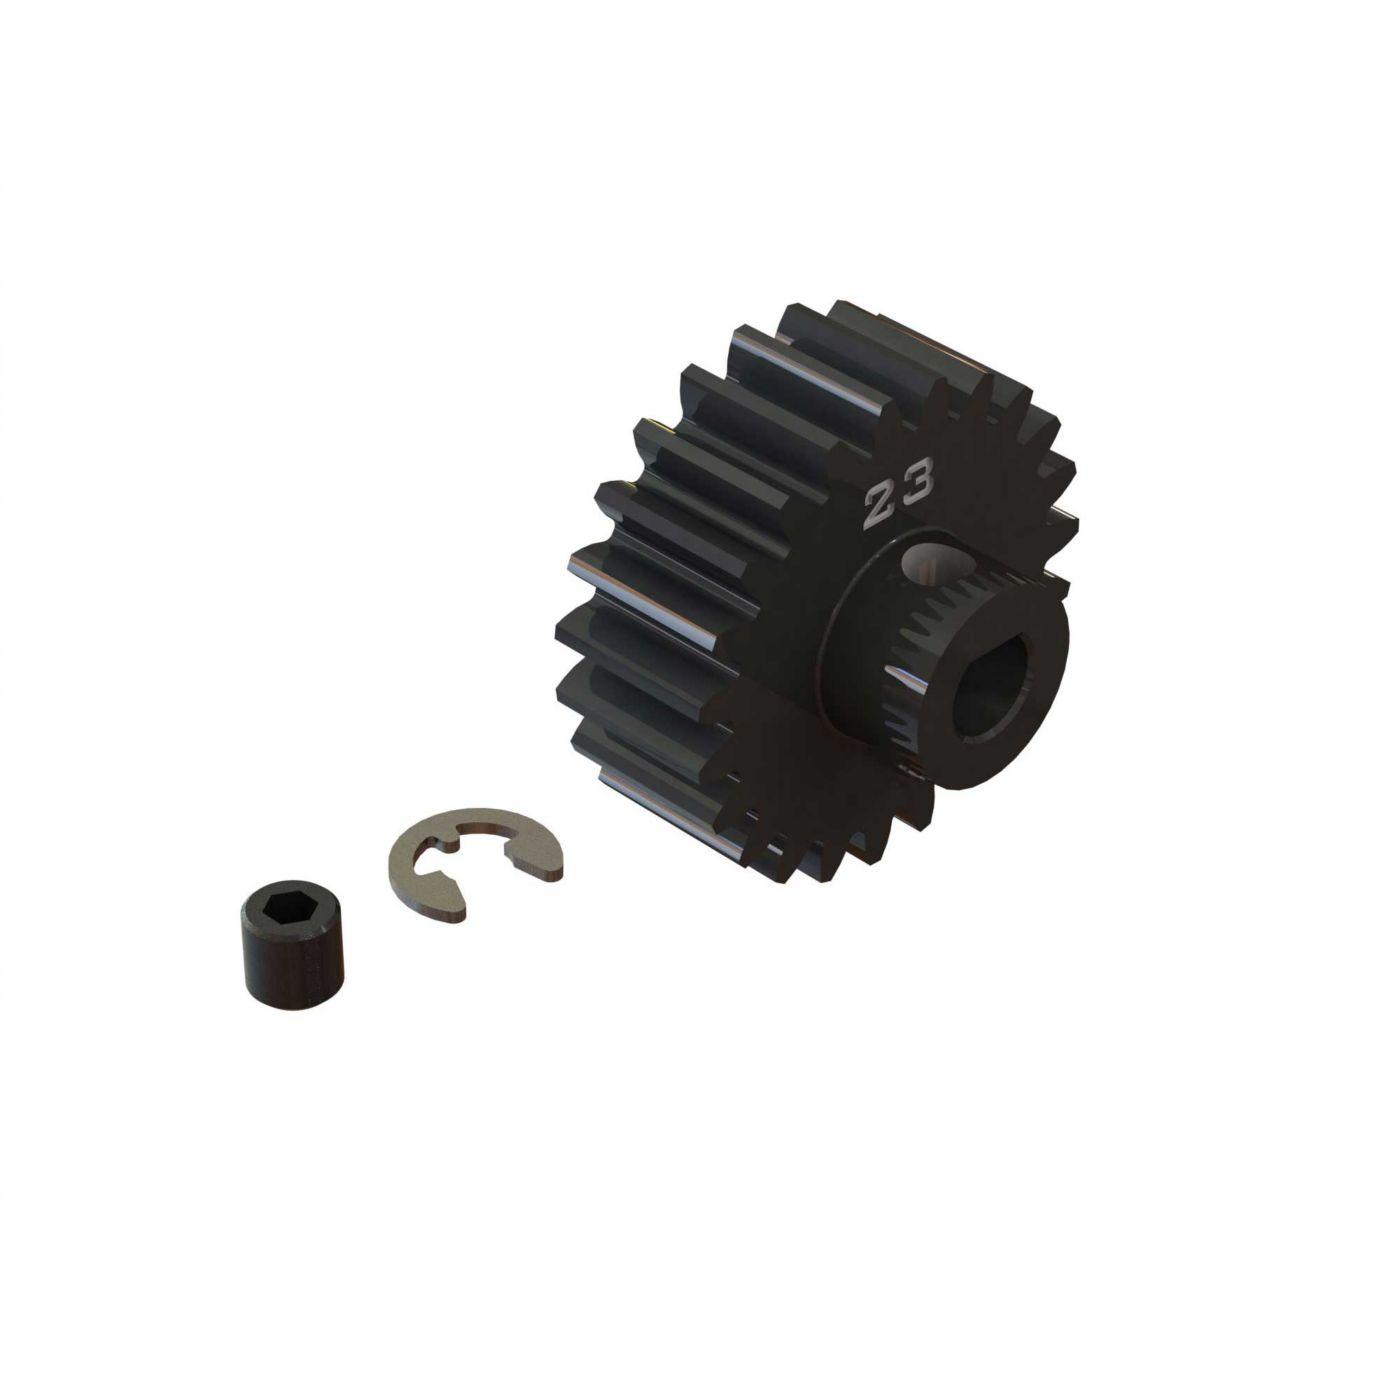 23T Mod1 Safe-D5 Pinion Gear